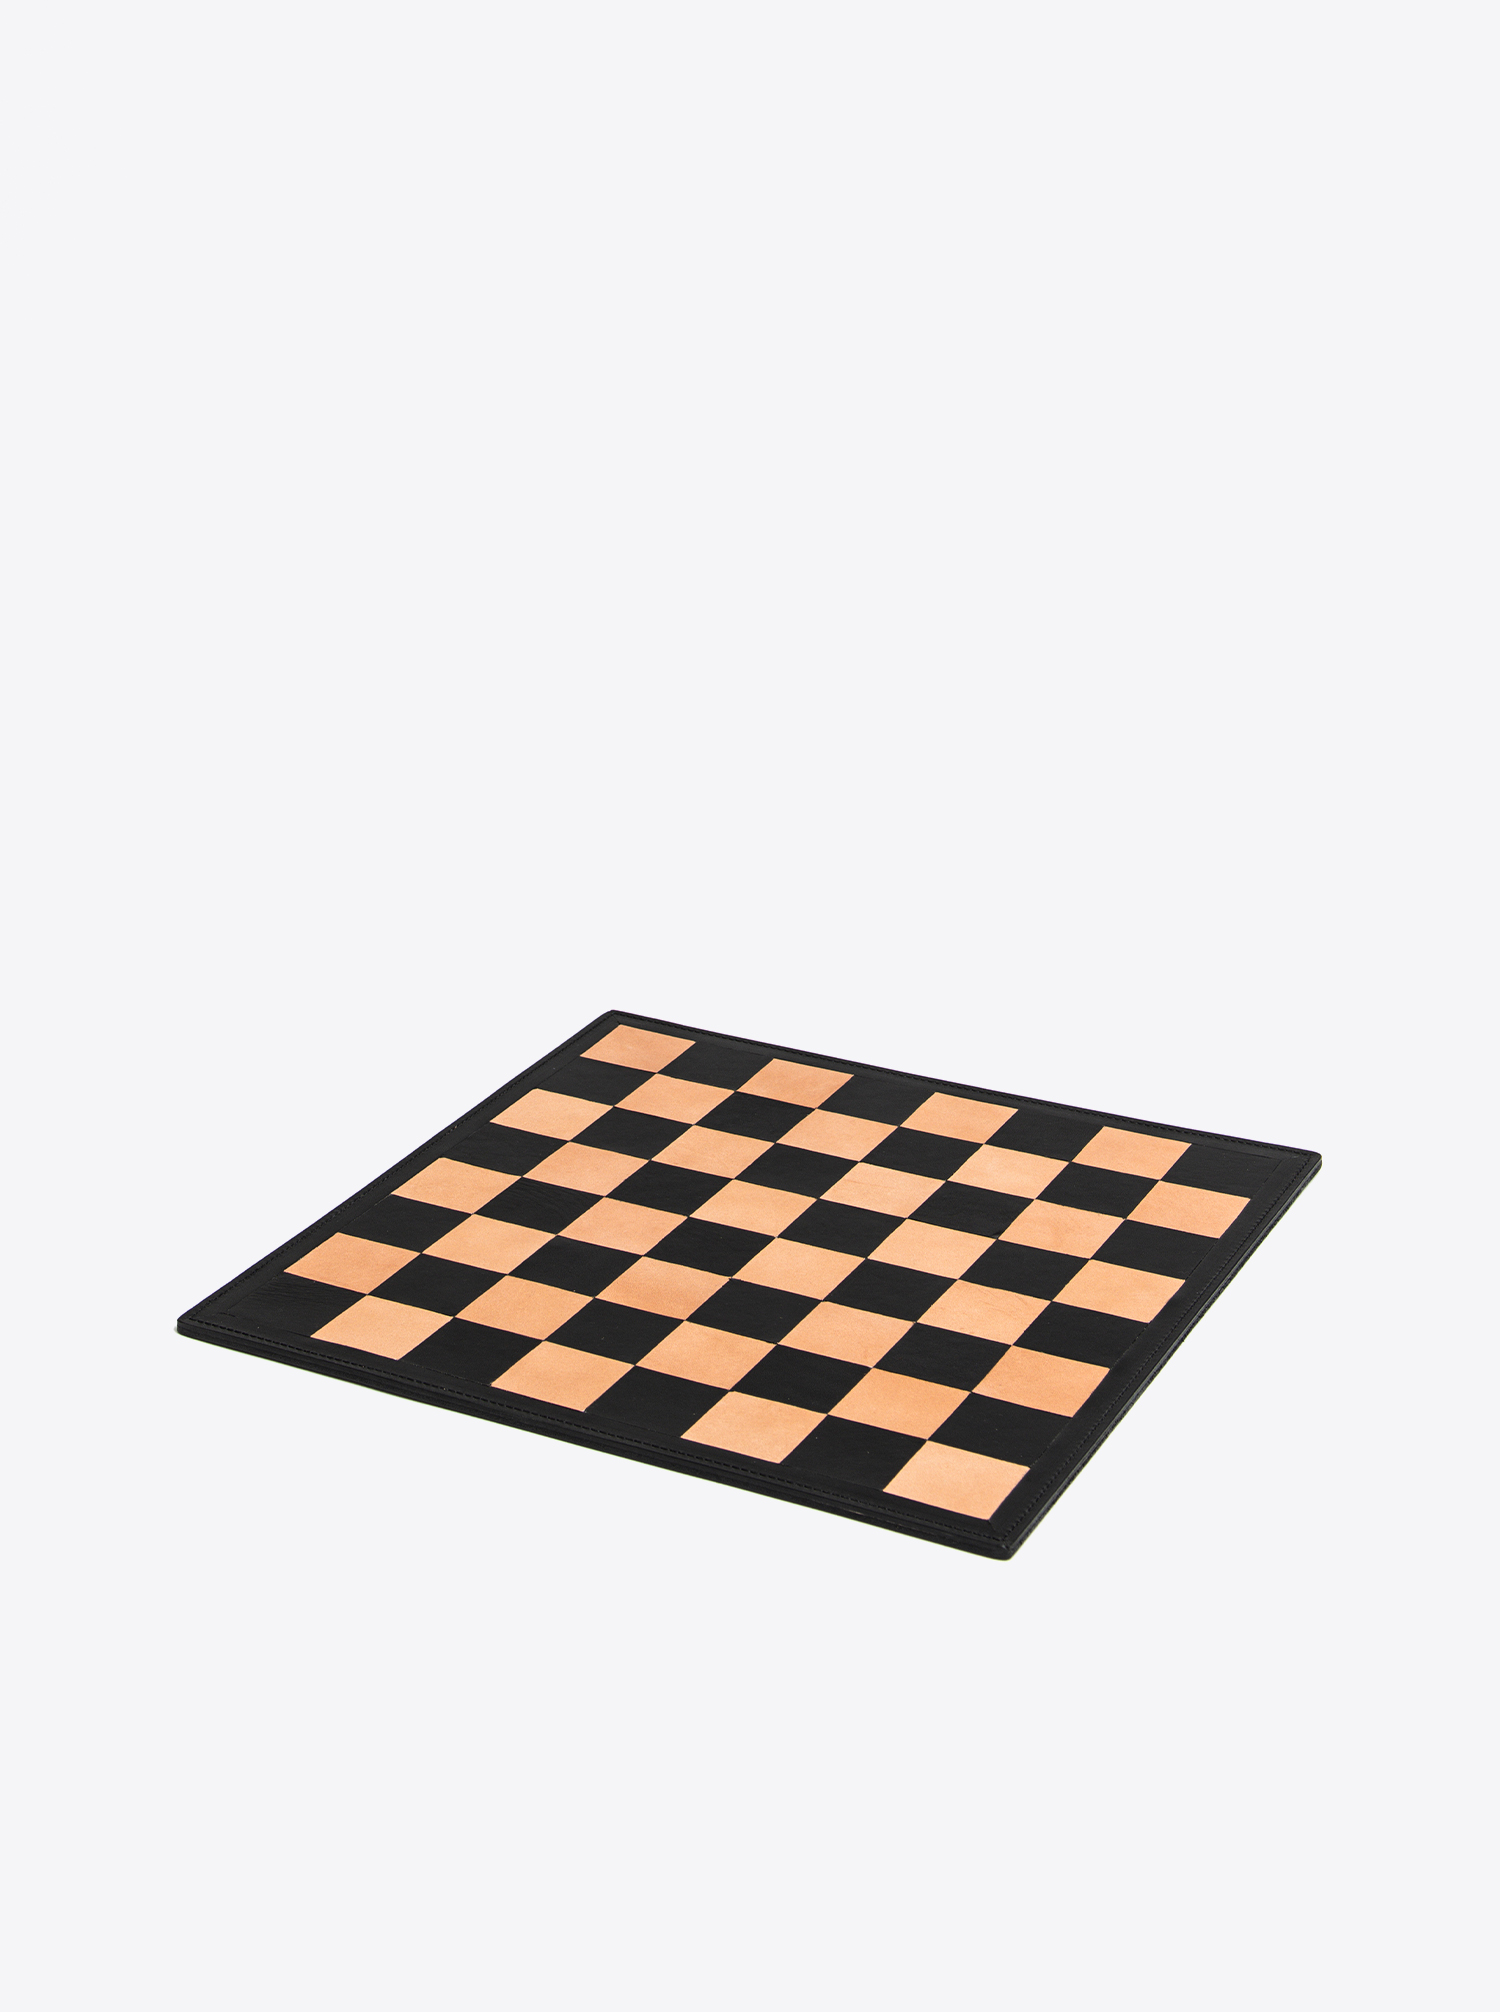 Chess Figures Cast Iron Enamel